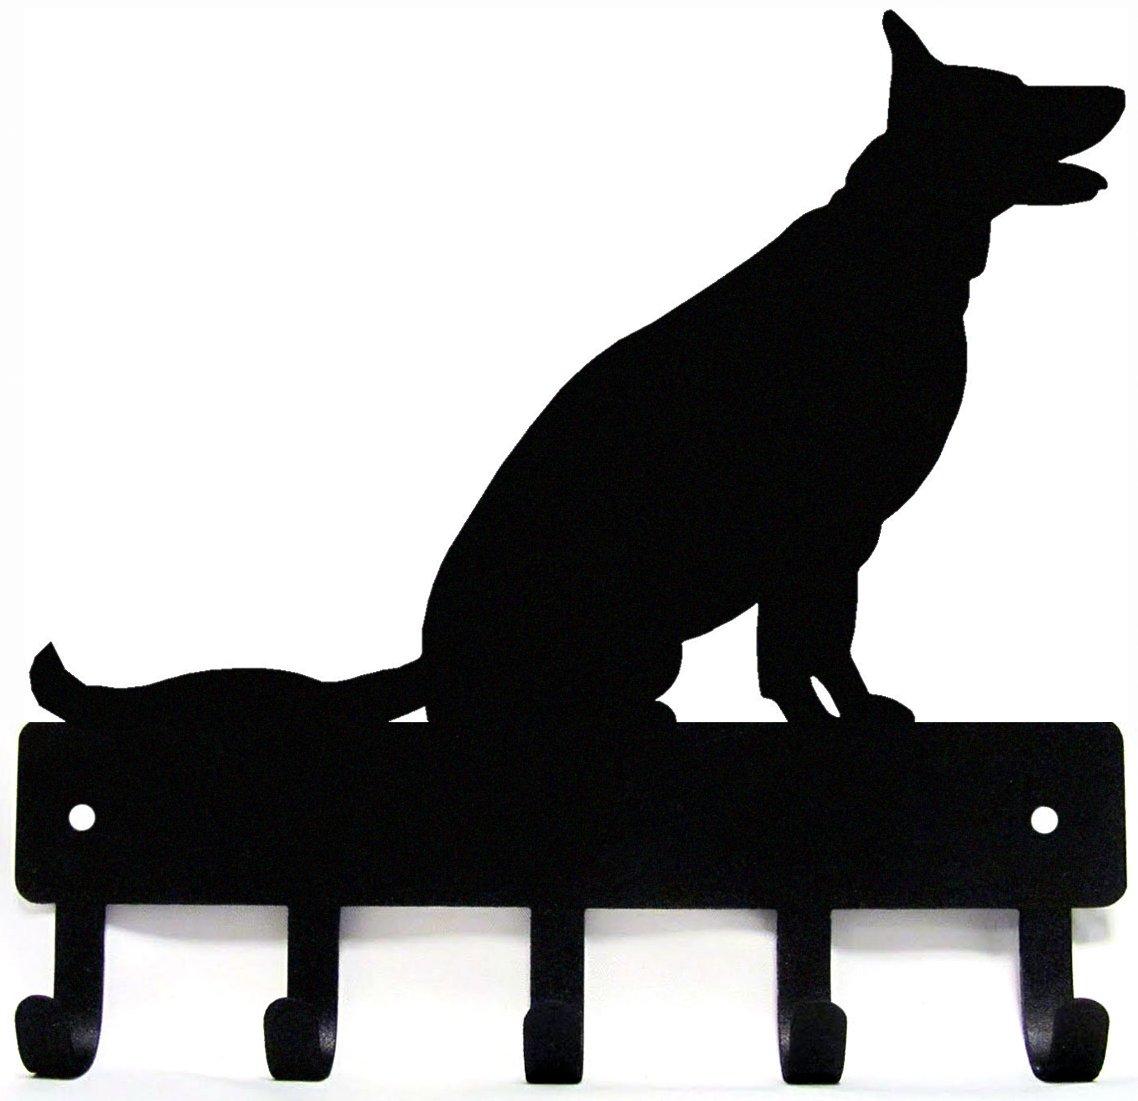 German Shepherd Sitting - Key Rack & Dog Leash Hanger - Large 9 inch